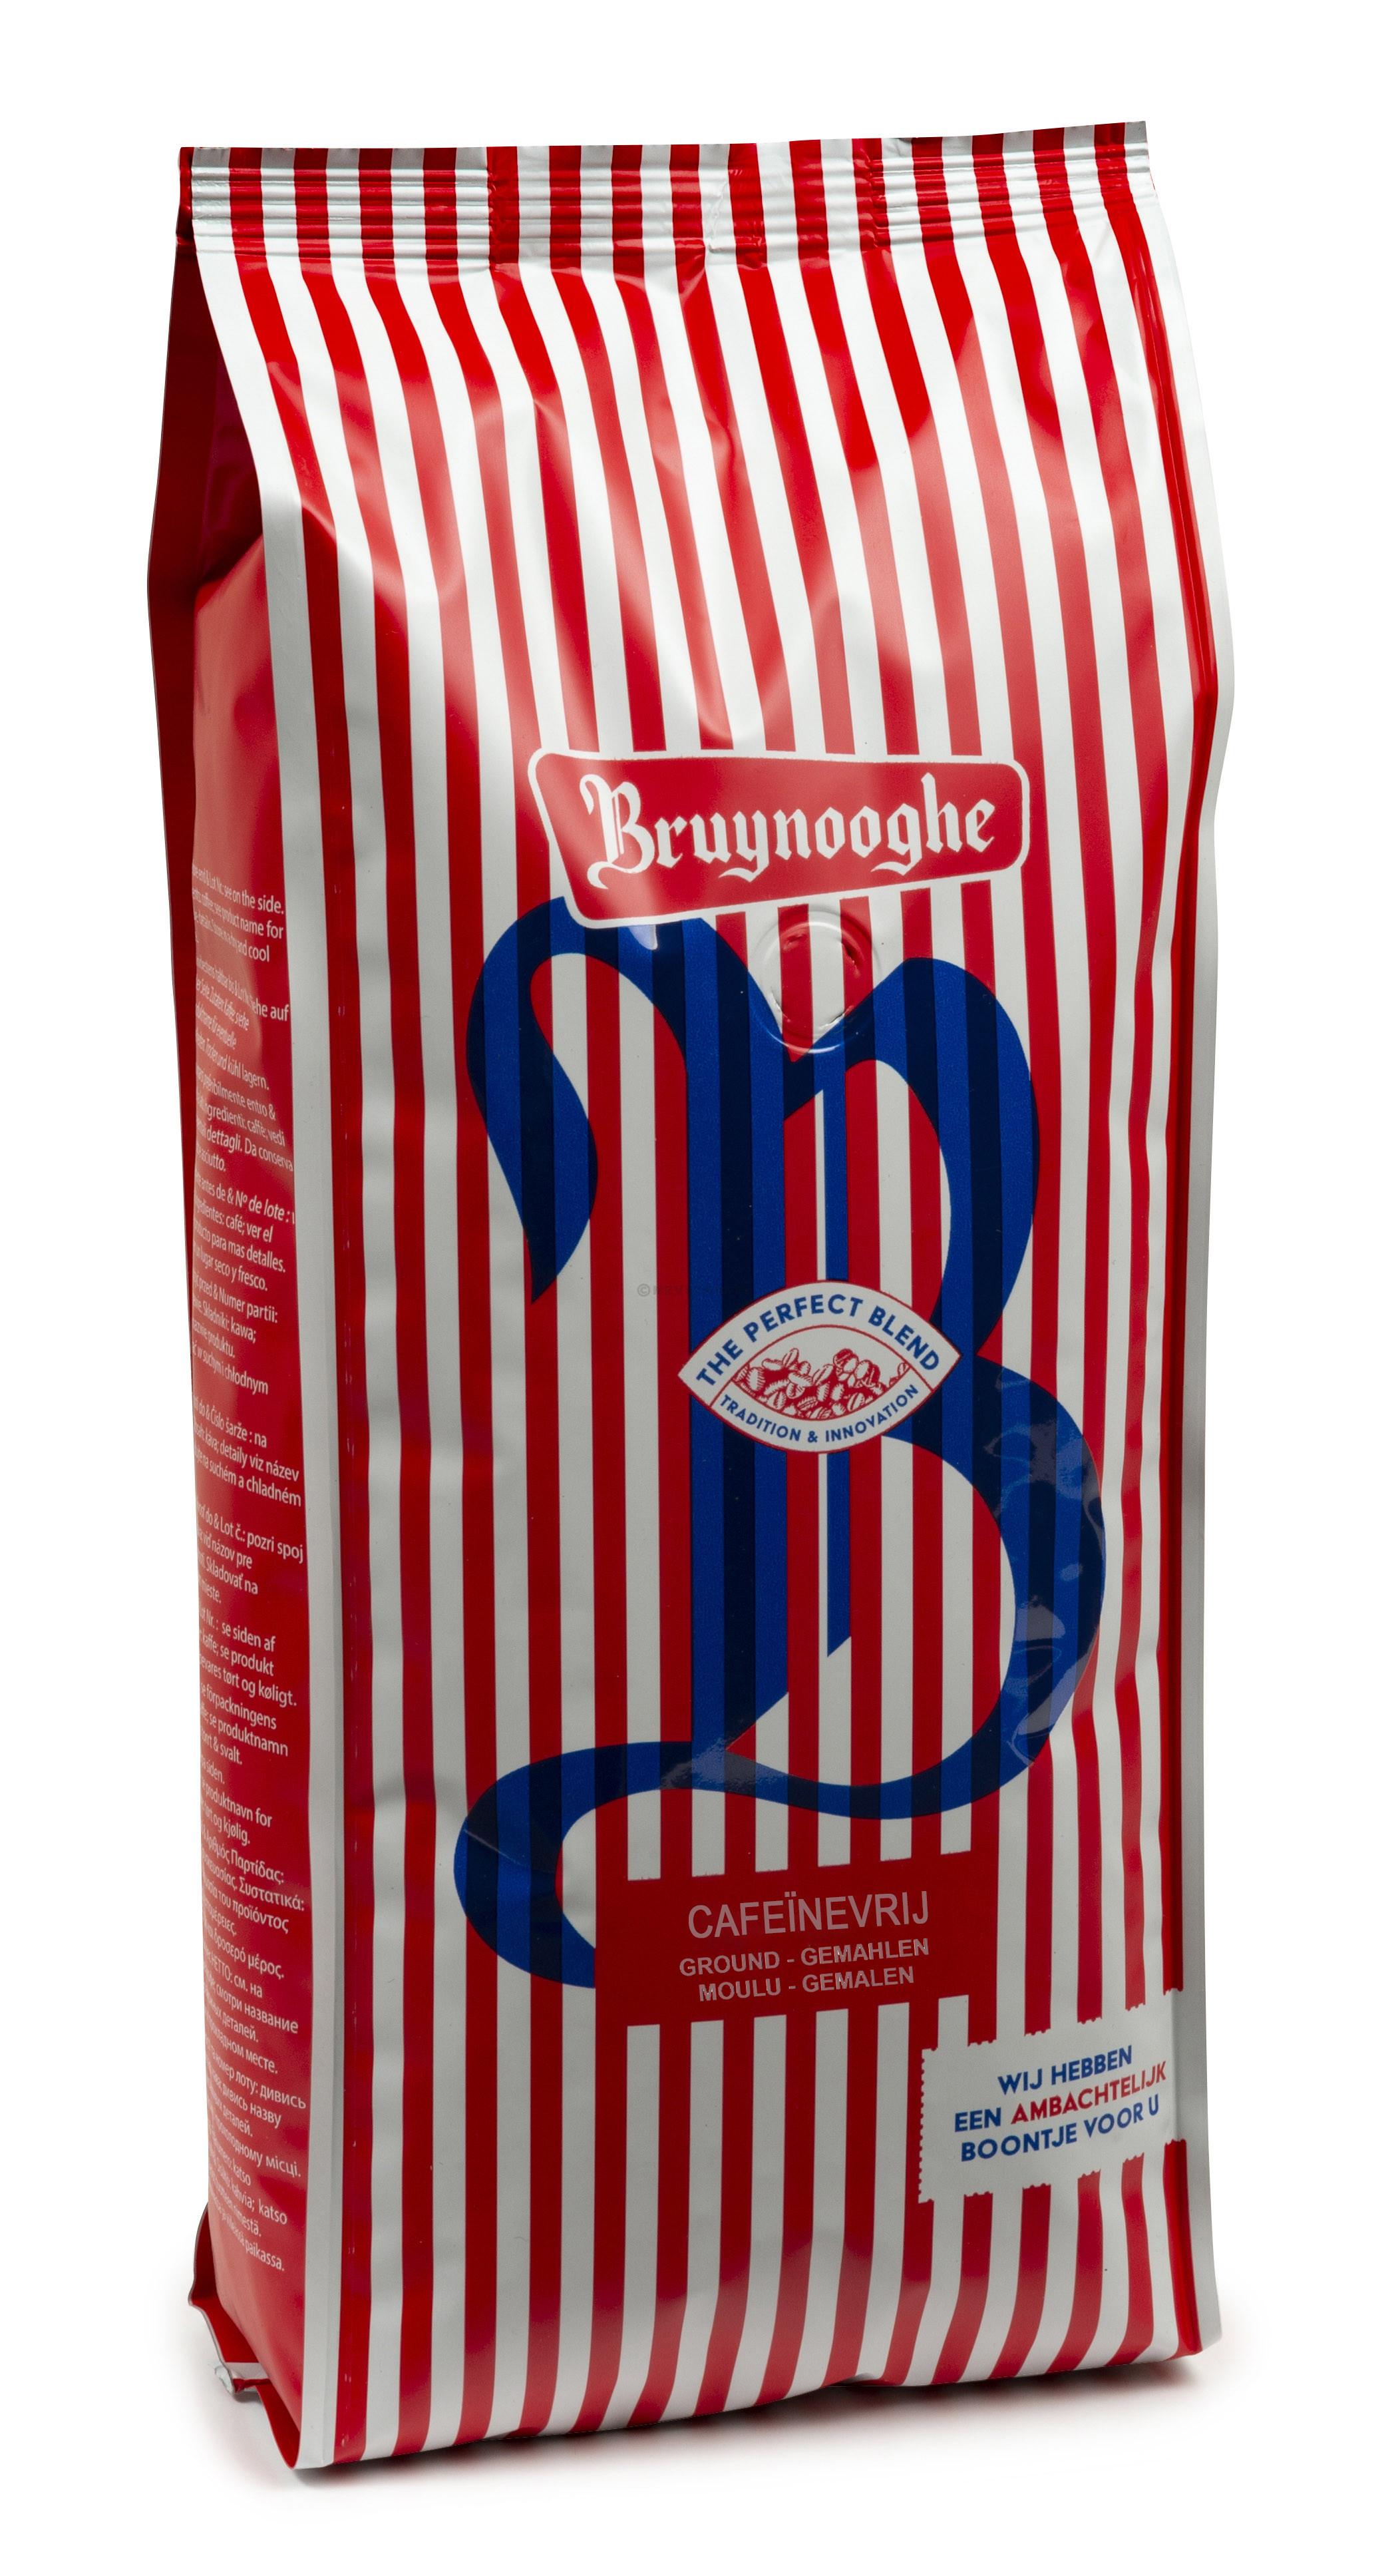 Café Bruynooghe Décaféine moulu 1kg (Koffie)